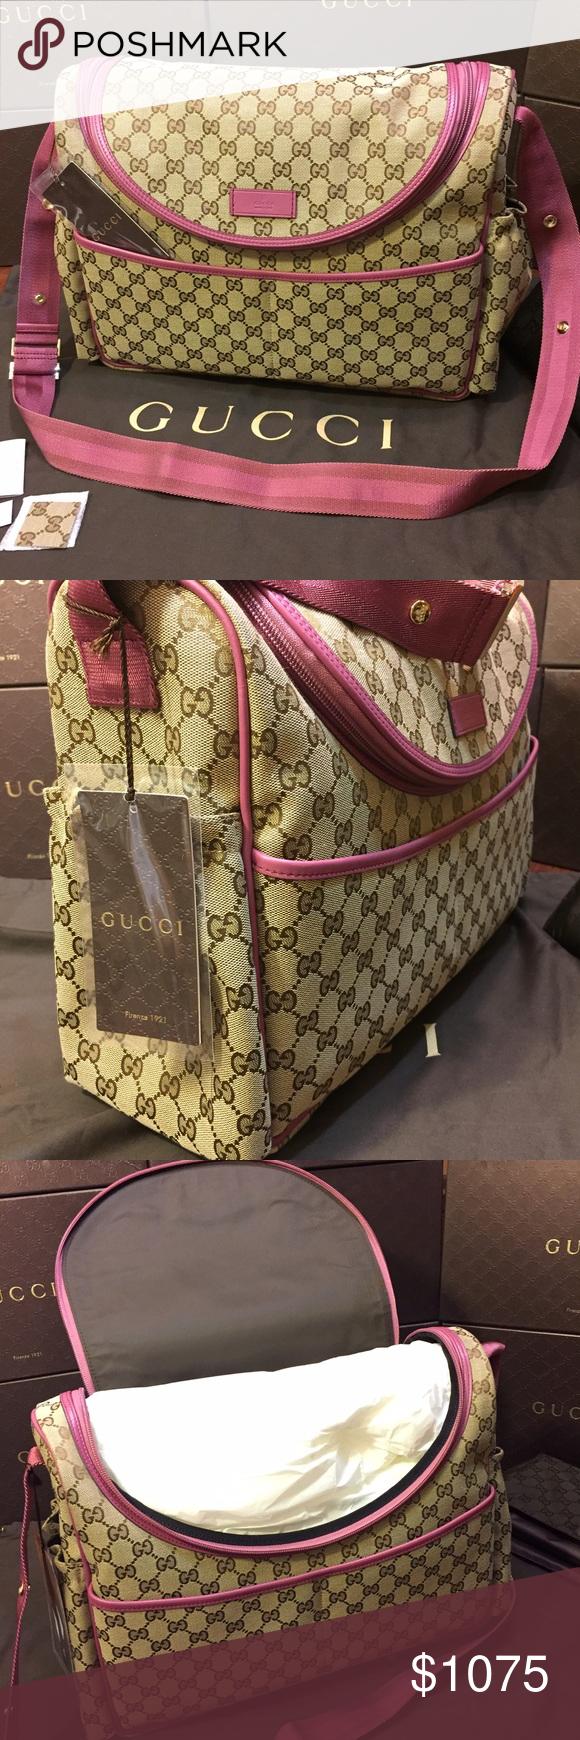 9c1c786621f9 Gucci Baby Girl Diaper Bag Original GG Canvas New with tags. Gucci Original  GG Canvas